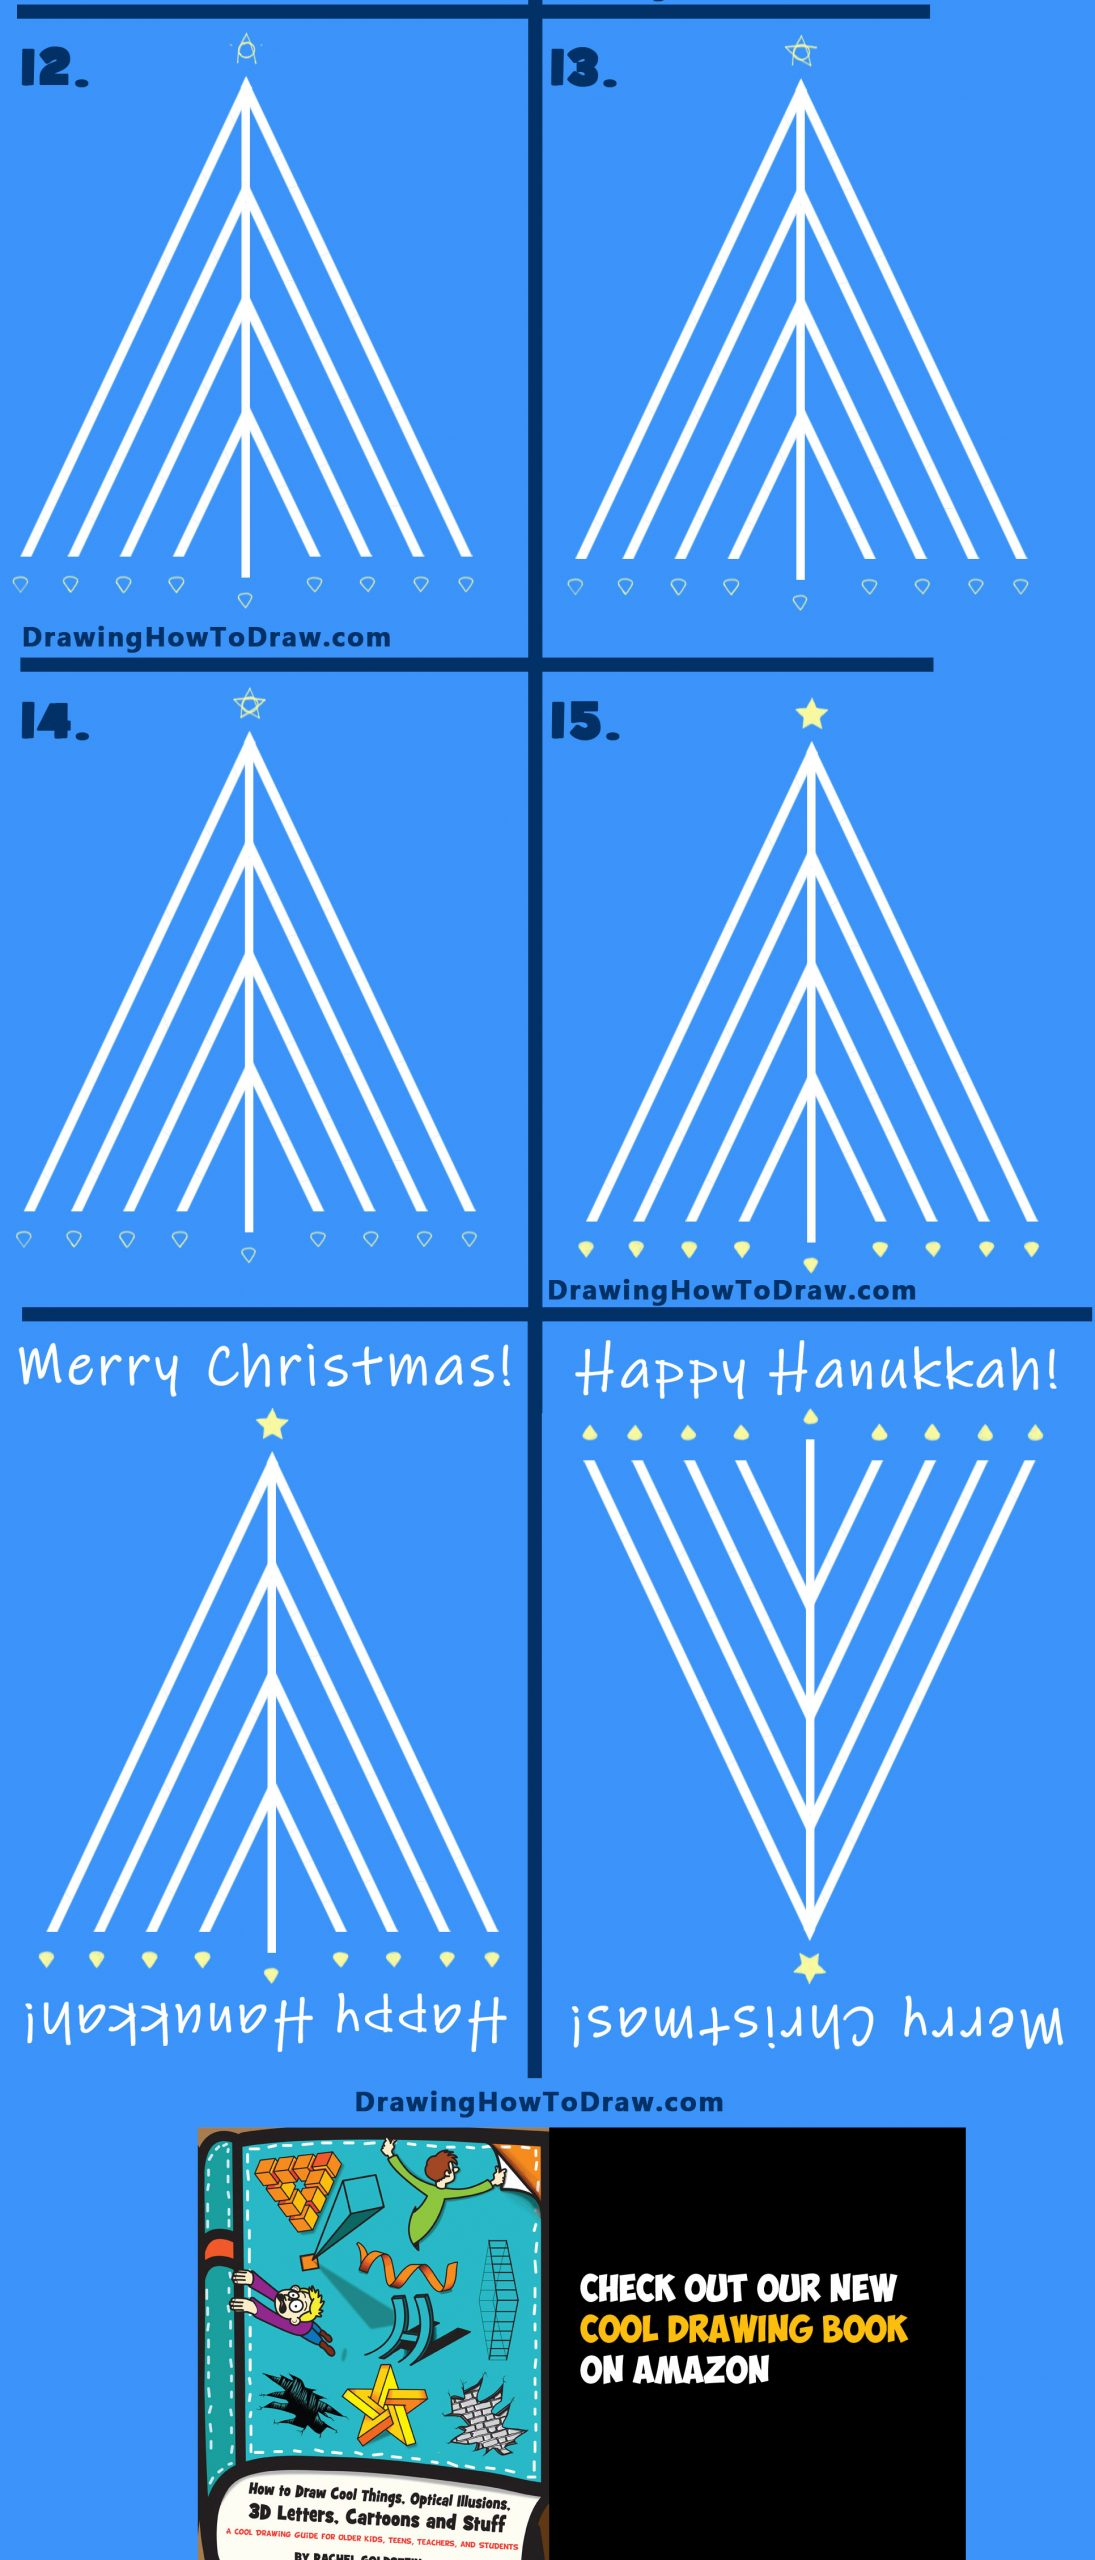 how to draw a christmas tree hanukkah menorah easy step by step drawing tutorial